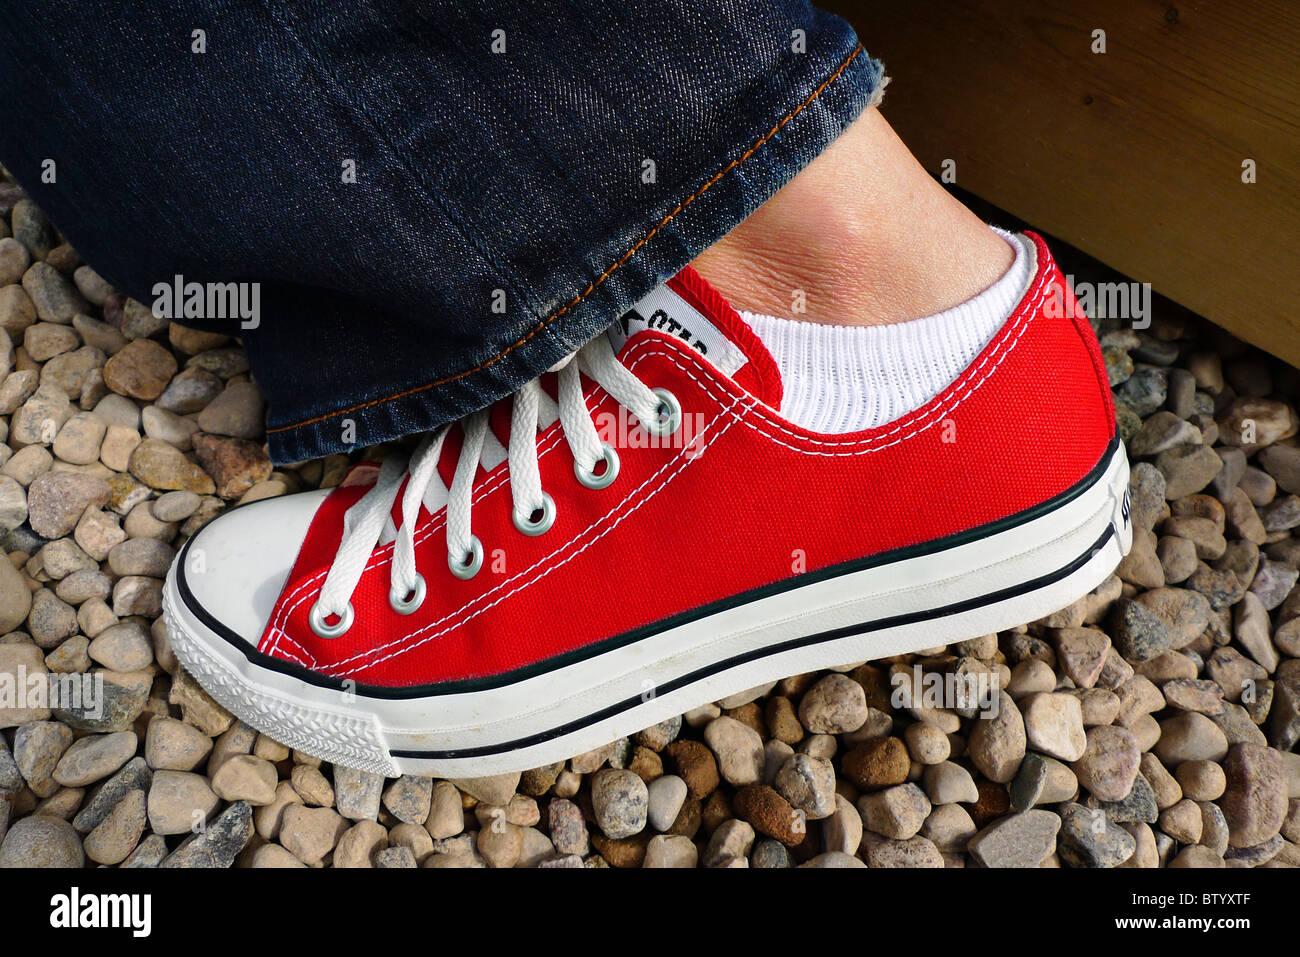 Red Converse Sneakers Immagini e Fotos Stock - Alamy